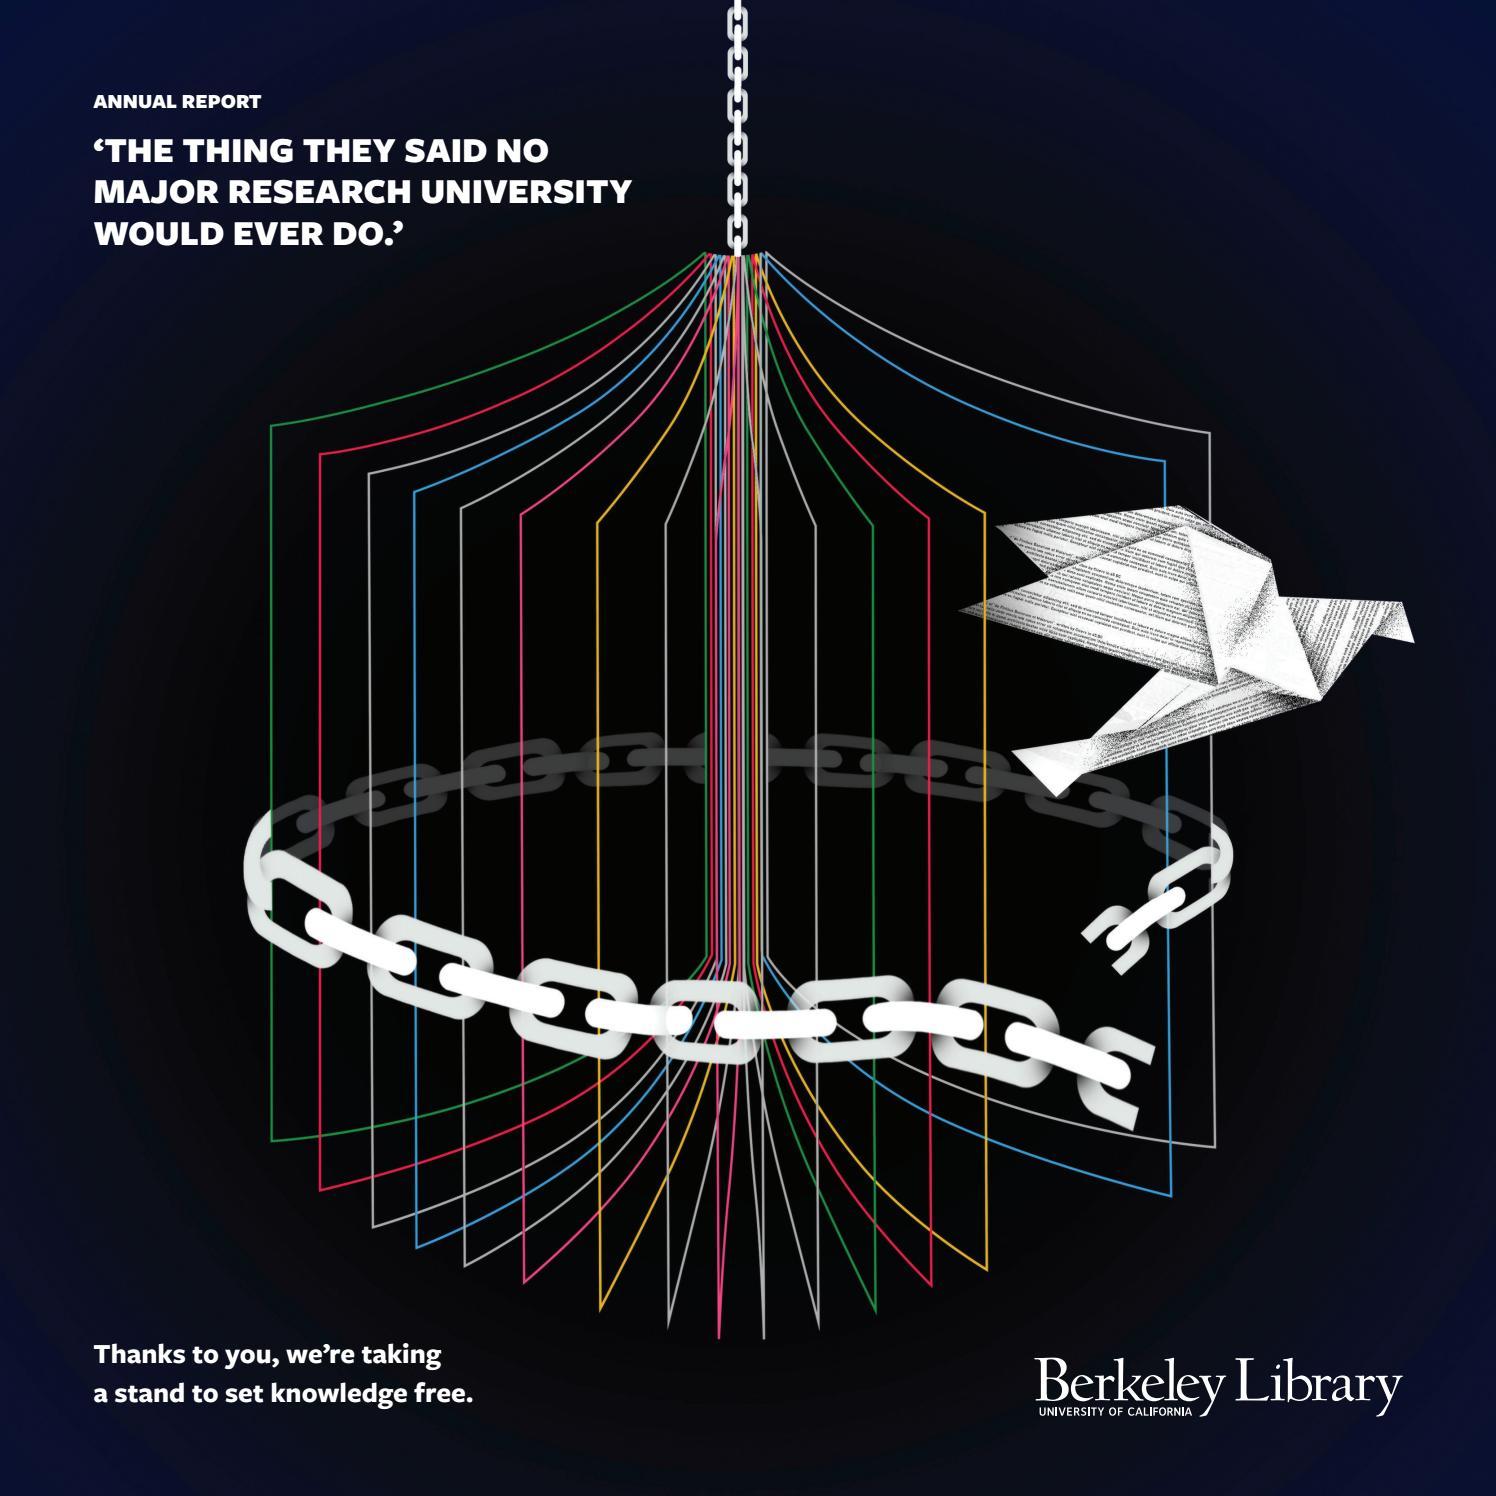 Annual Report Fy 201819 By Uc Berkeley Library  Issuu inside Uc Berkeley Academic Calendar 2017